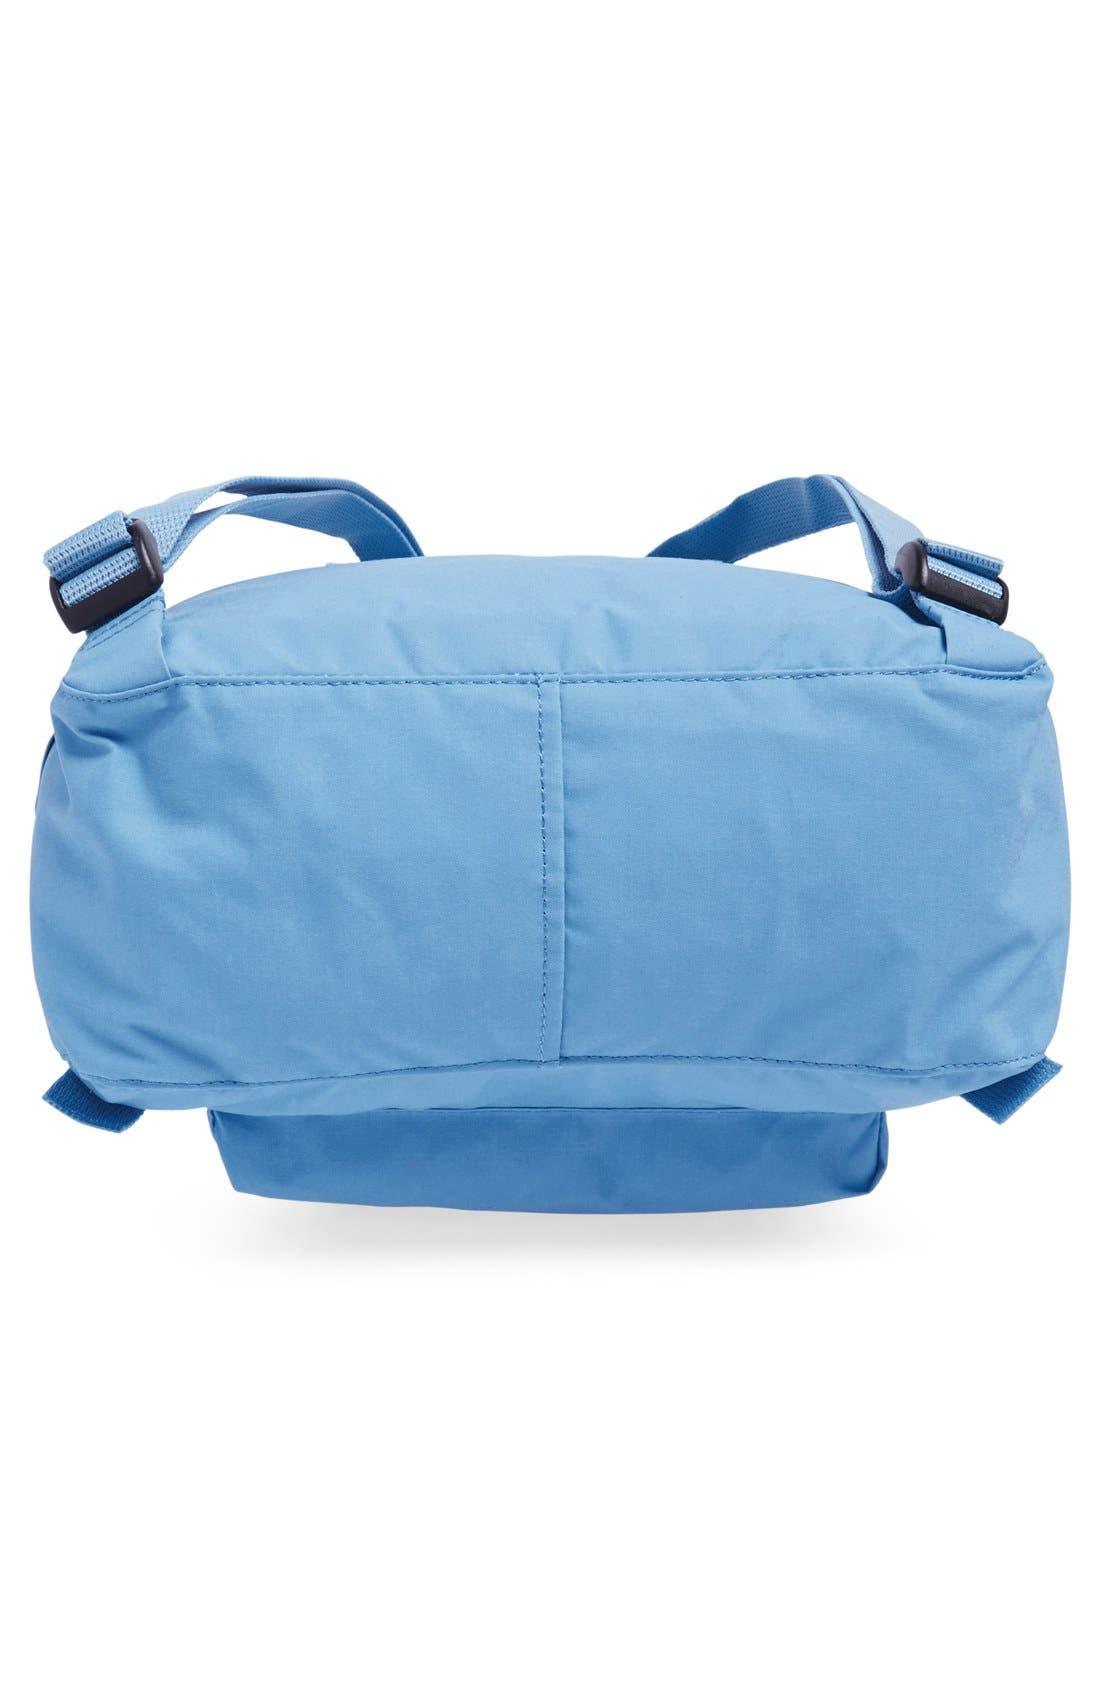 'Kånken' Water Resistant Backpack,                             Alternate thumbnail 331, color,